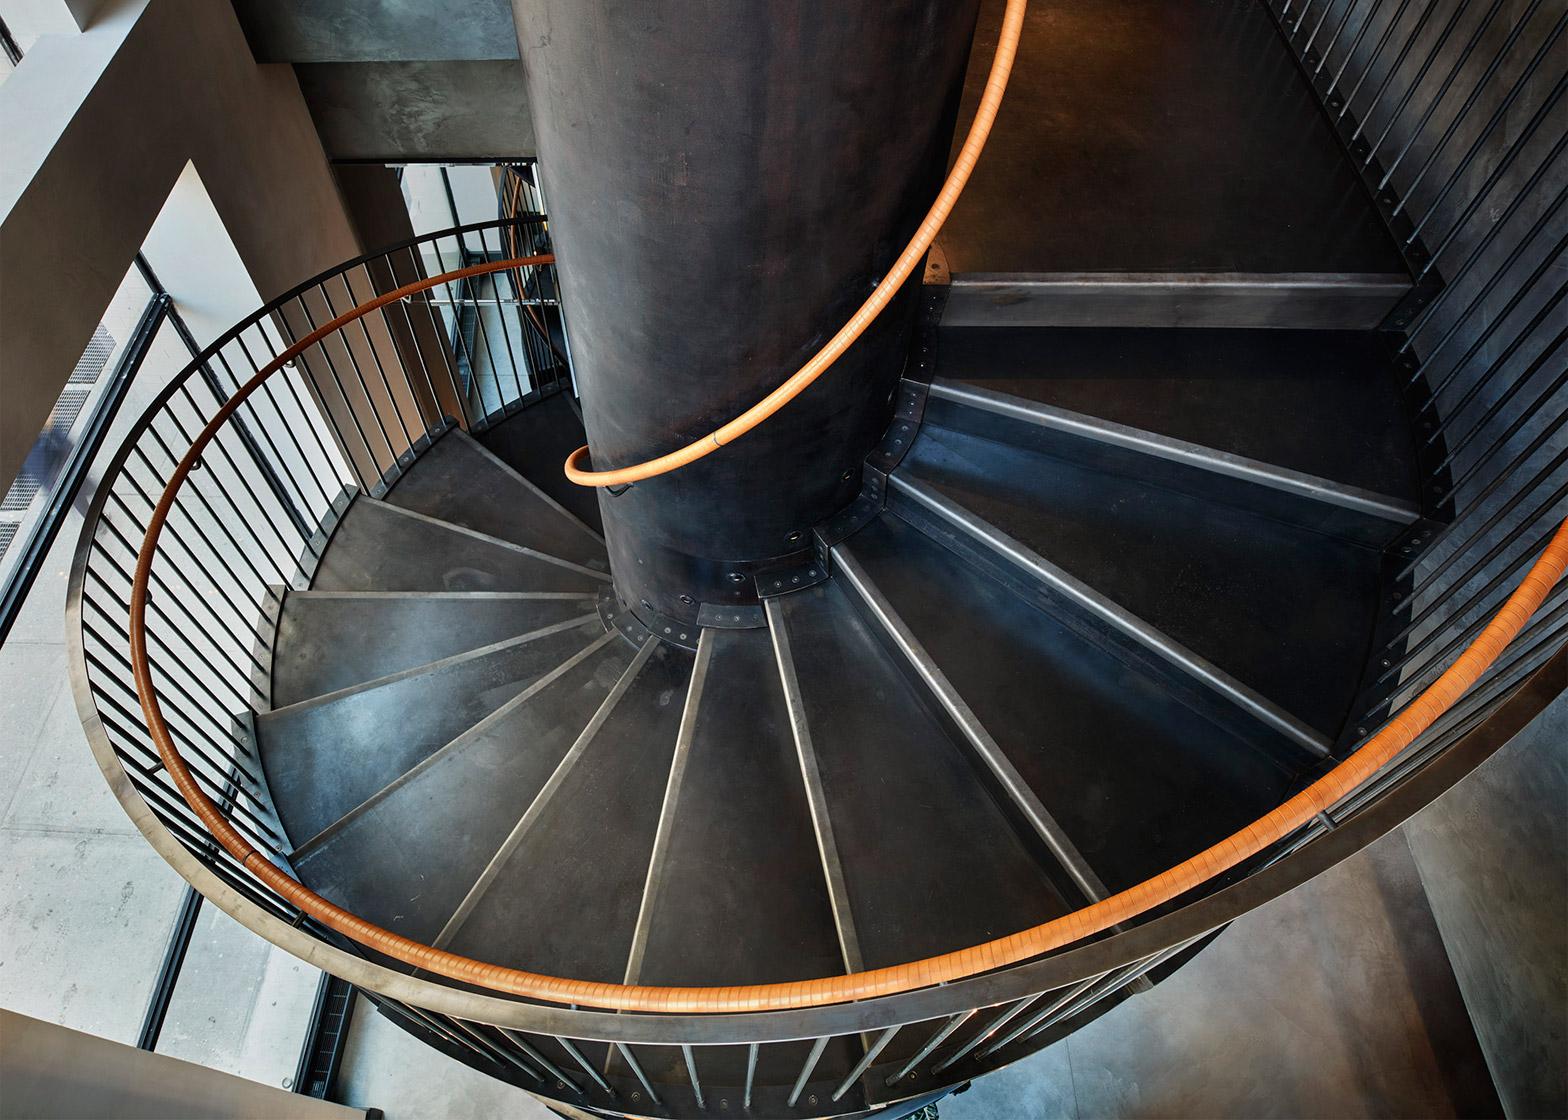 11-howard-space-copenhagen-hotel-interior-new-york-city-soho-usa_dezeen_1568_12